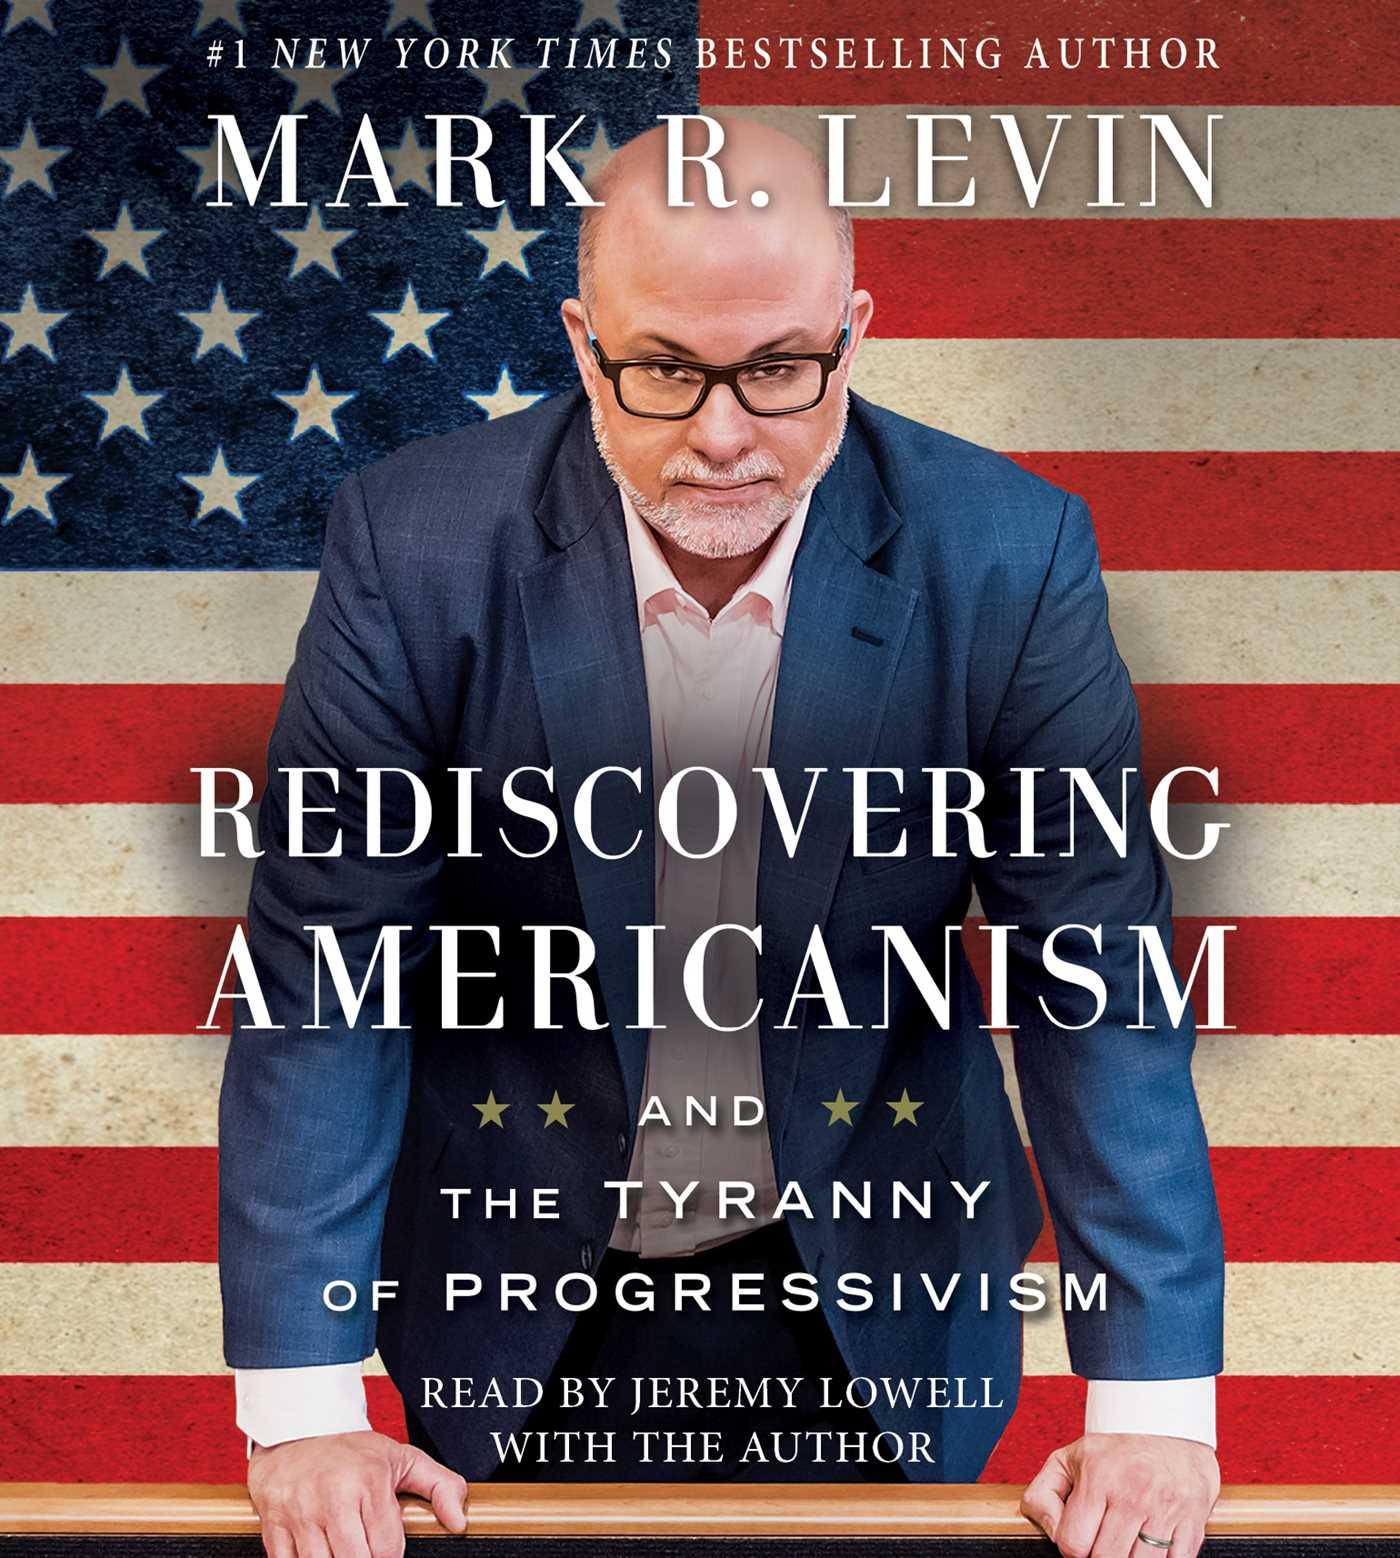 Rediscovering americanism 9781508236221 hr